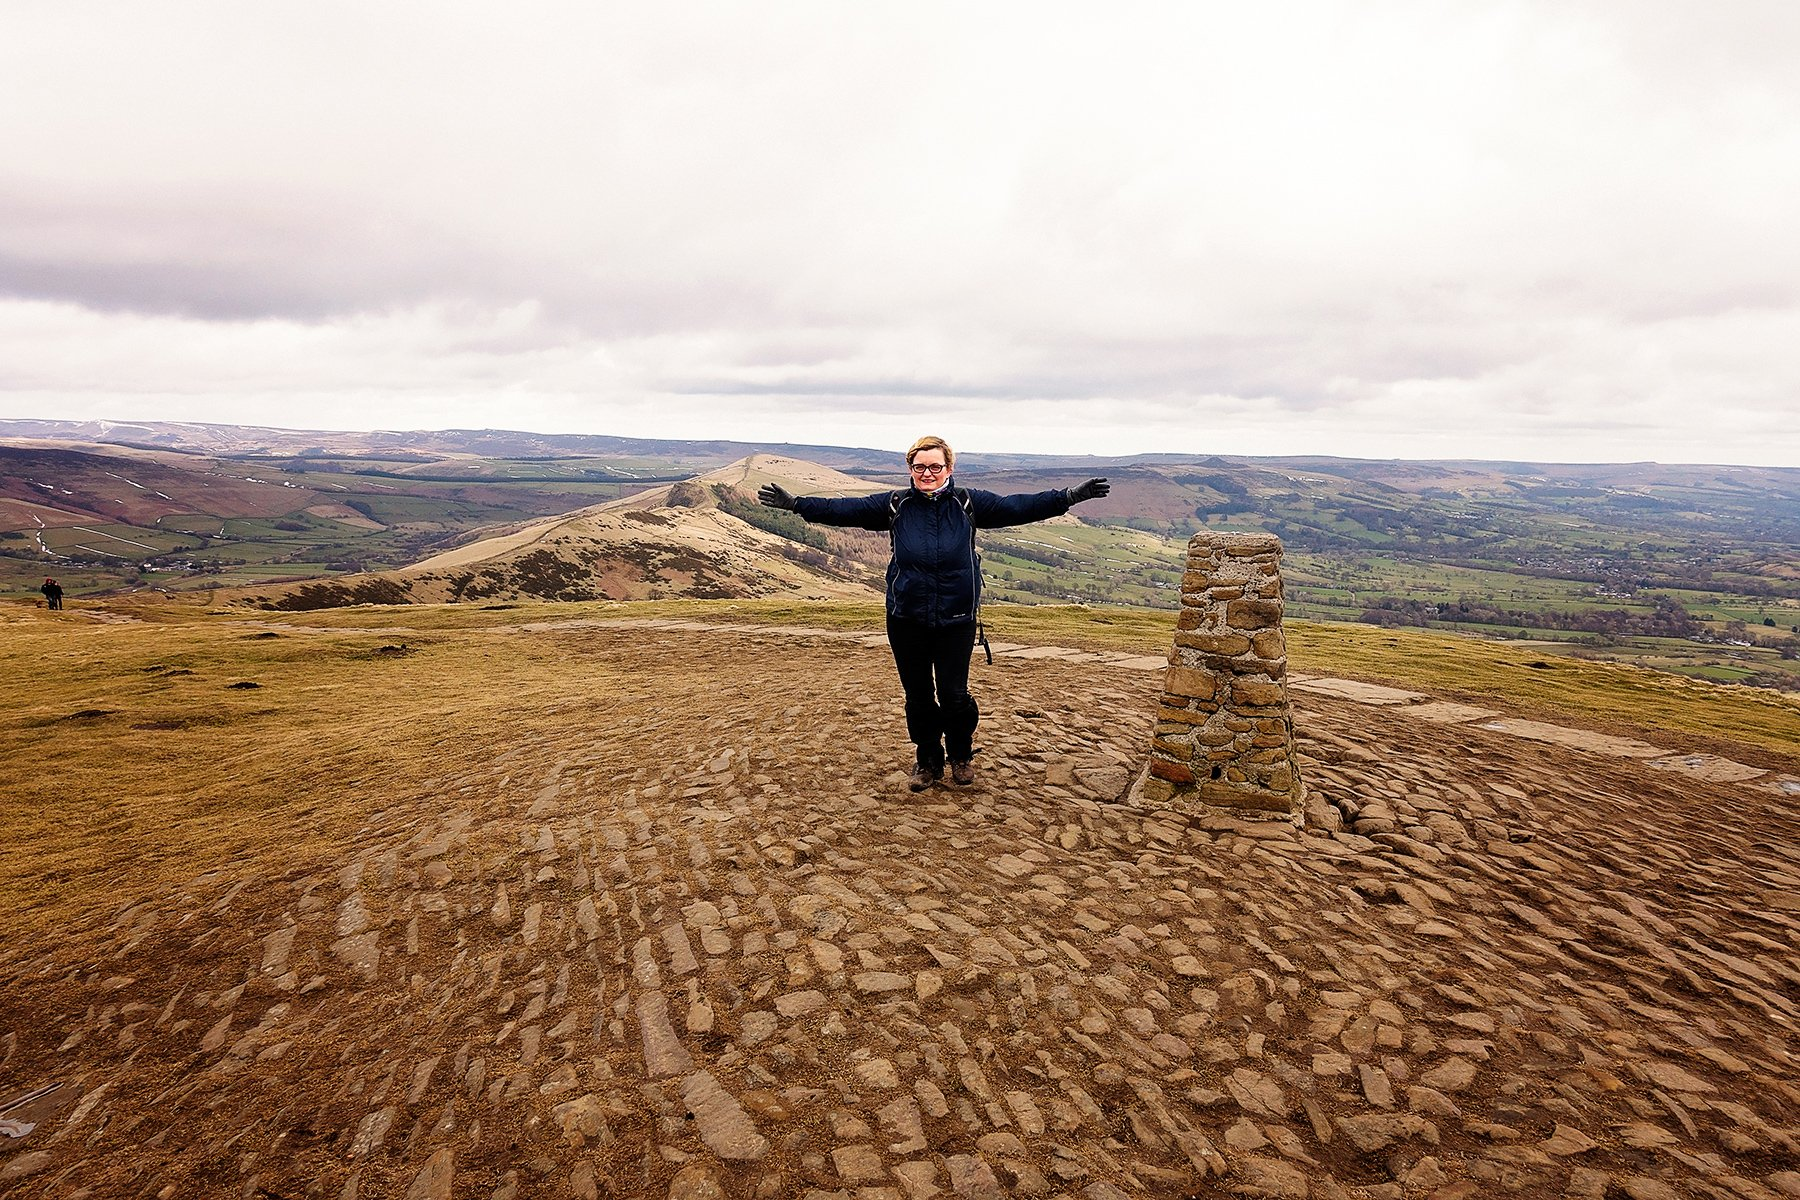 Mam Tor and the Great Ridge Walk